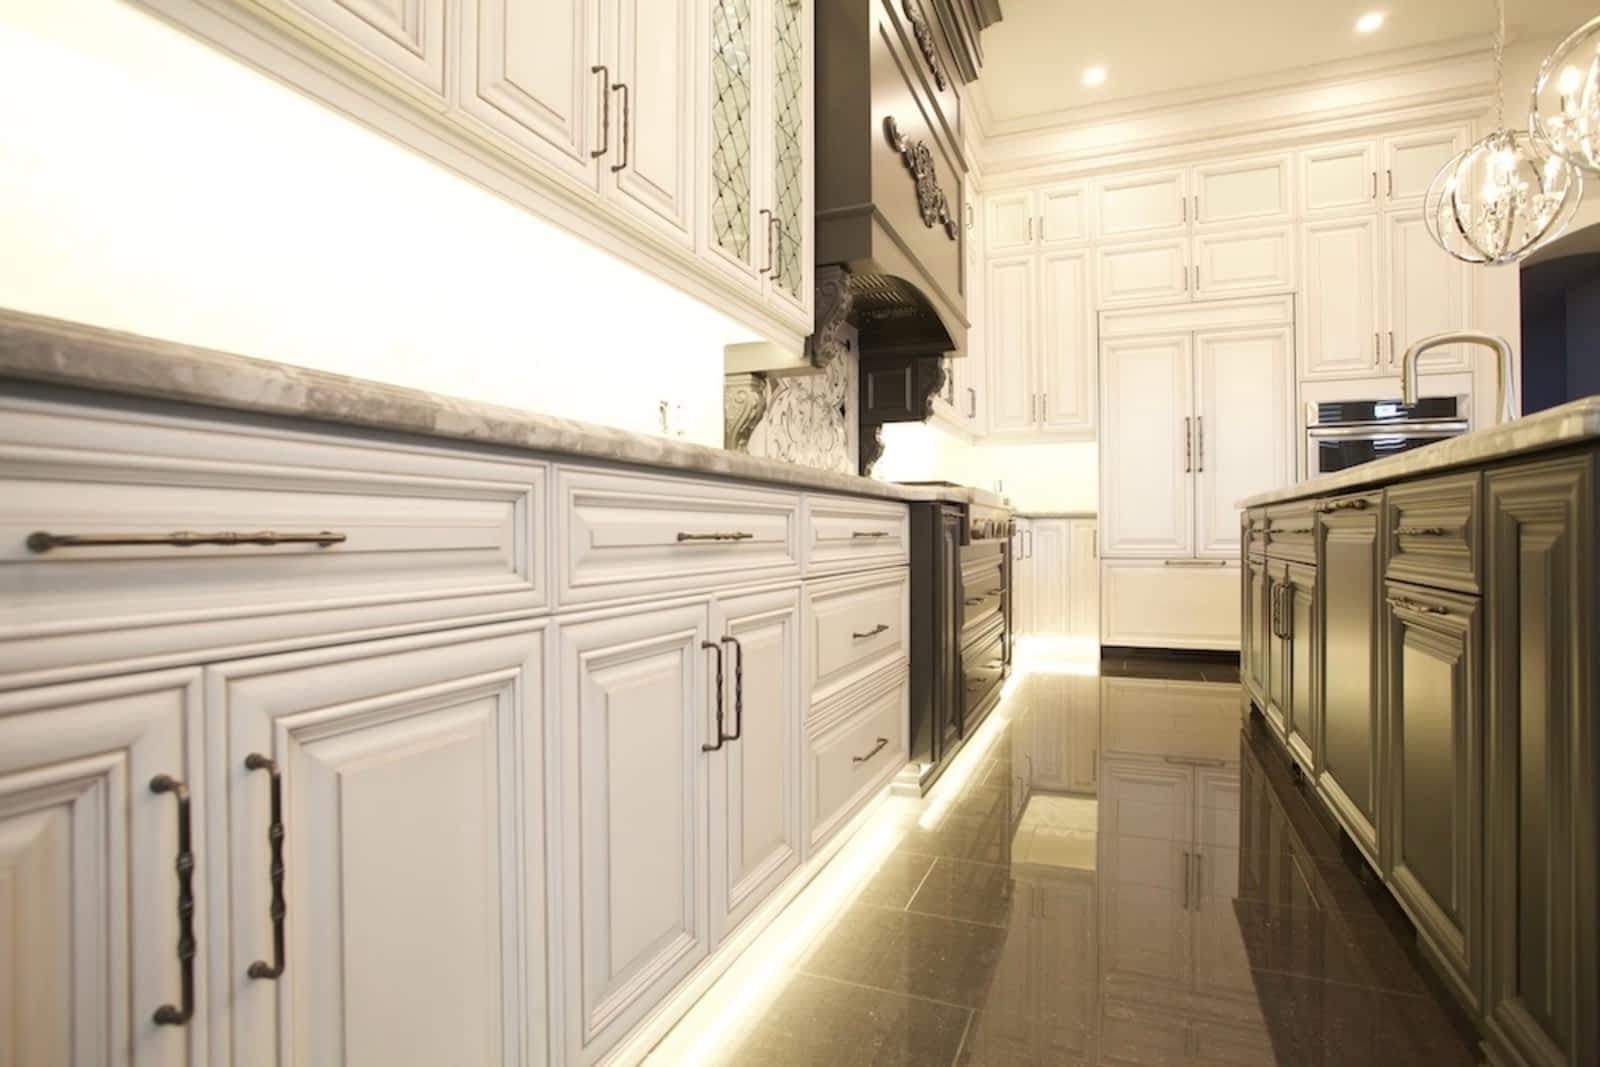 Br&ton Kitchen u0026 Cabinets Ltd. - Opening Hours - 159 Rutherford Rd S Br&ton ON & Brampton Kitchen u0026 Cabinets Ltd. - Opening Hours - 159 Rutherford Rd ...